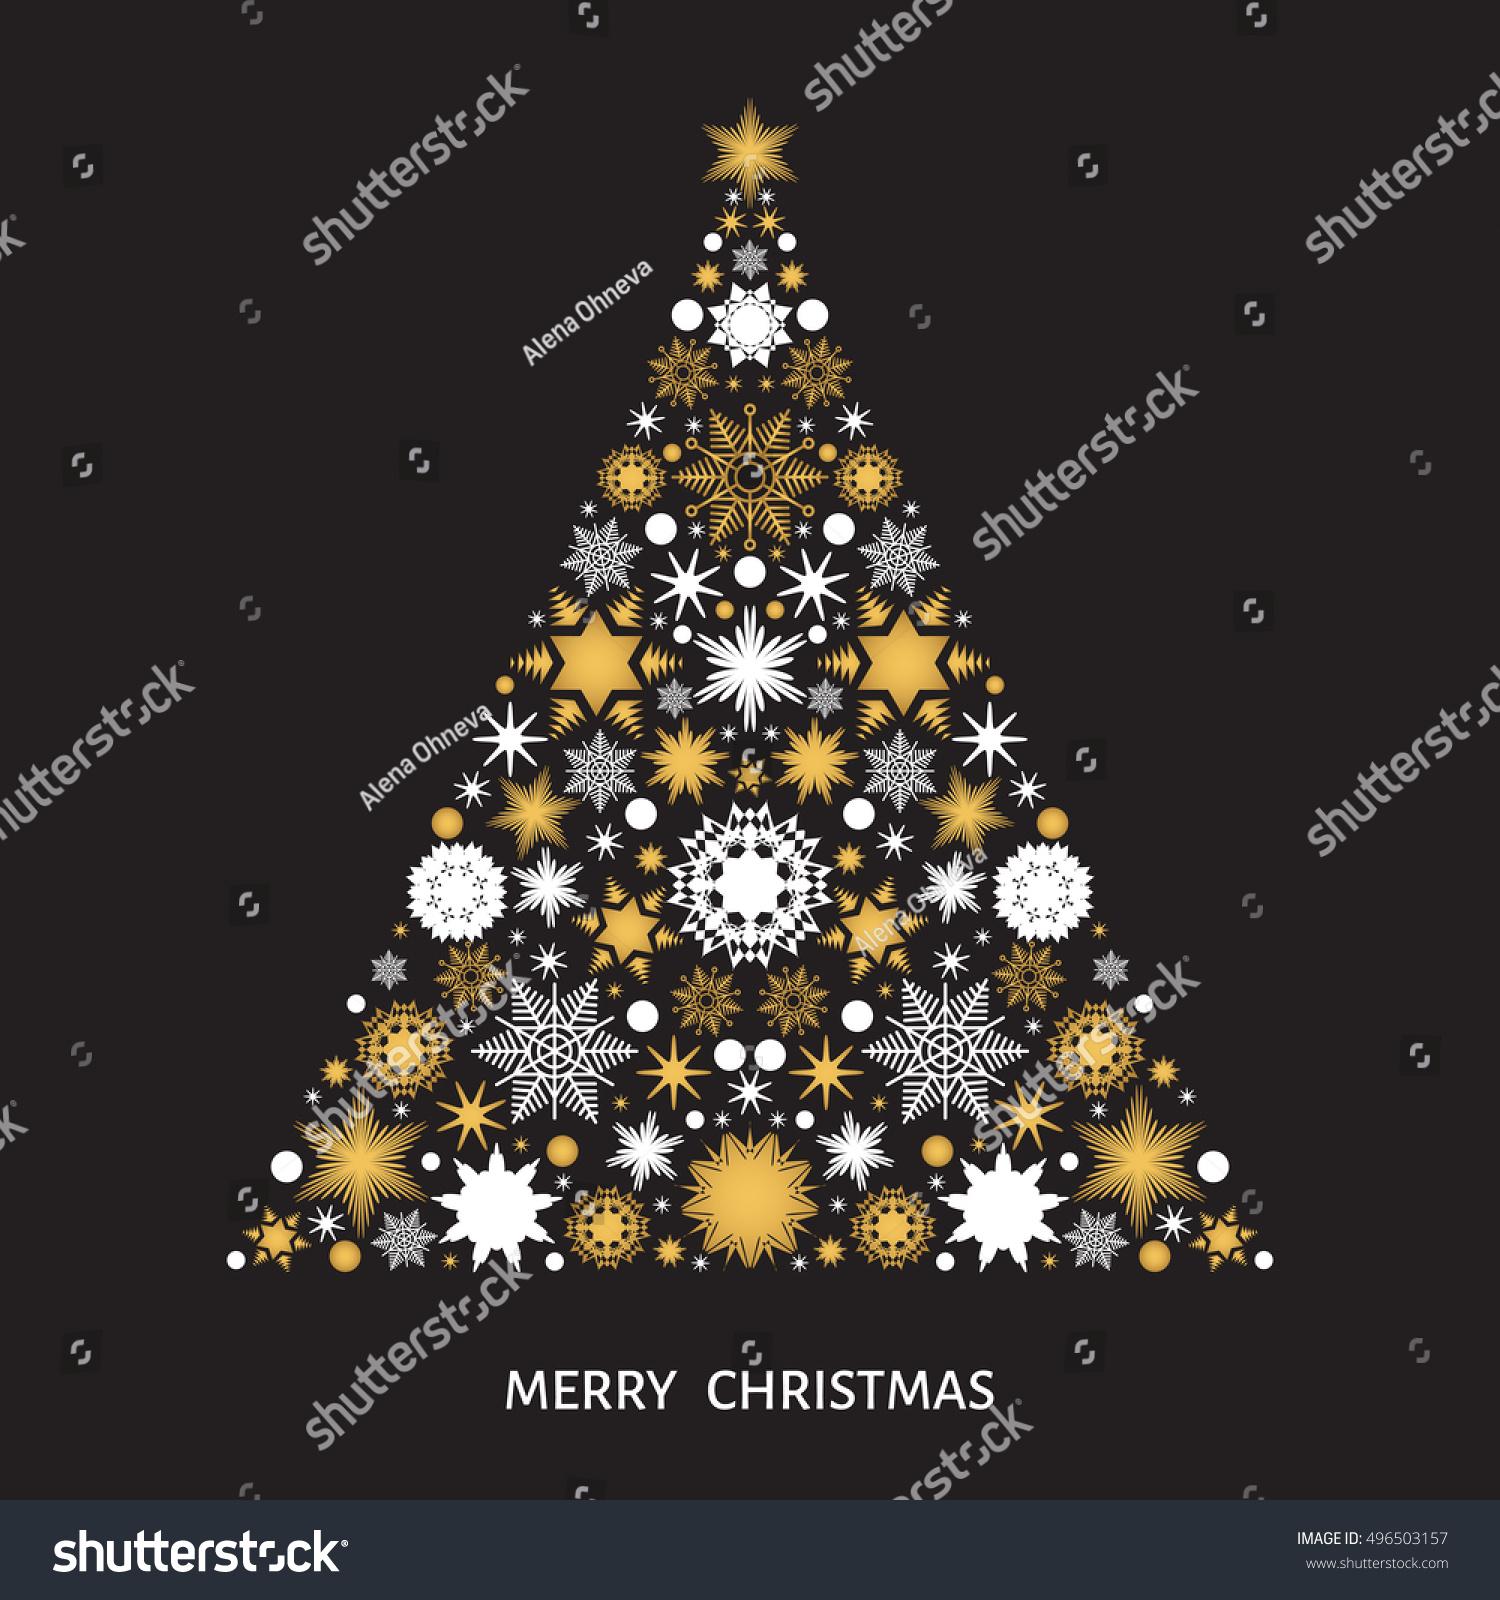 Christmas Tree Decoration Elements: Christmas Tree Gold White Snowflakes Xmas Stock Vector